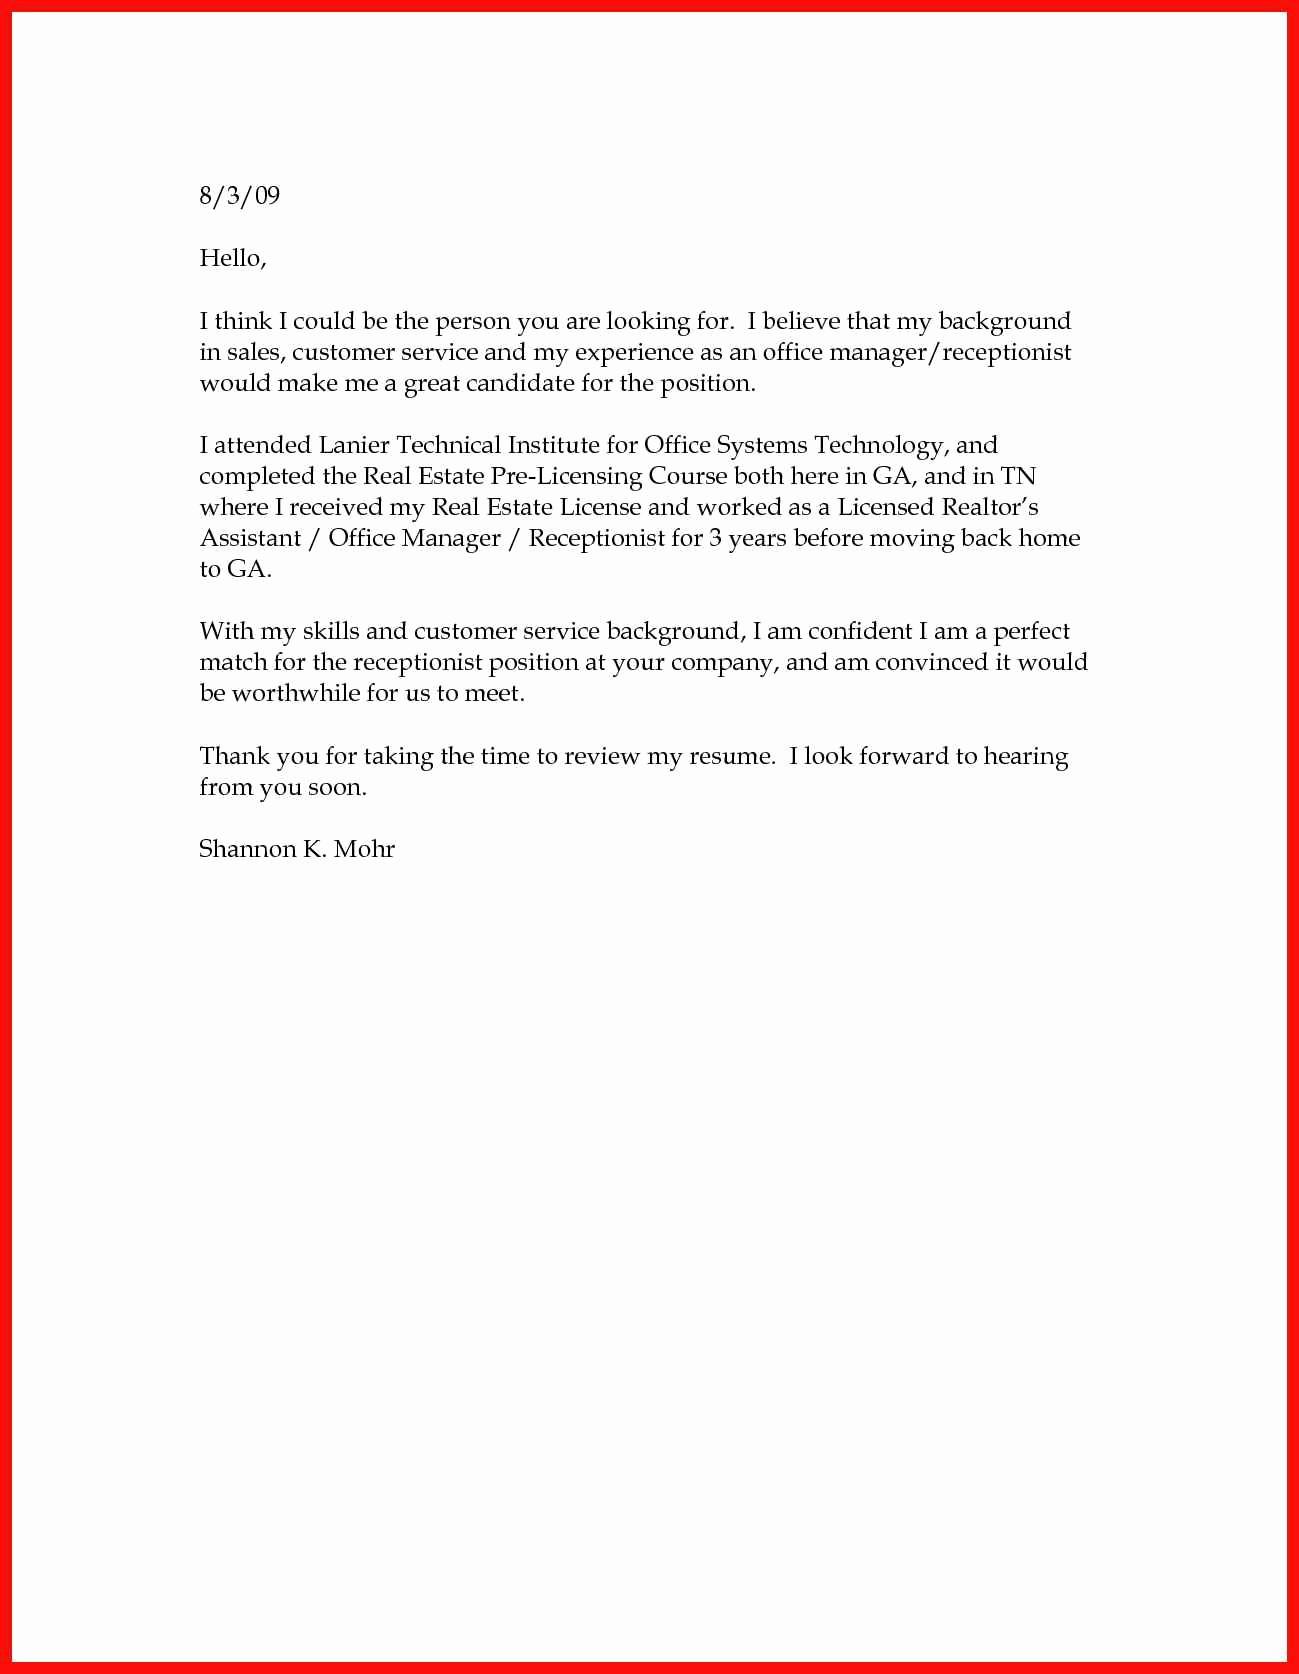 Sample Resume and Cover Letter Best Of Basic Cover Letter Sample